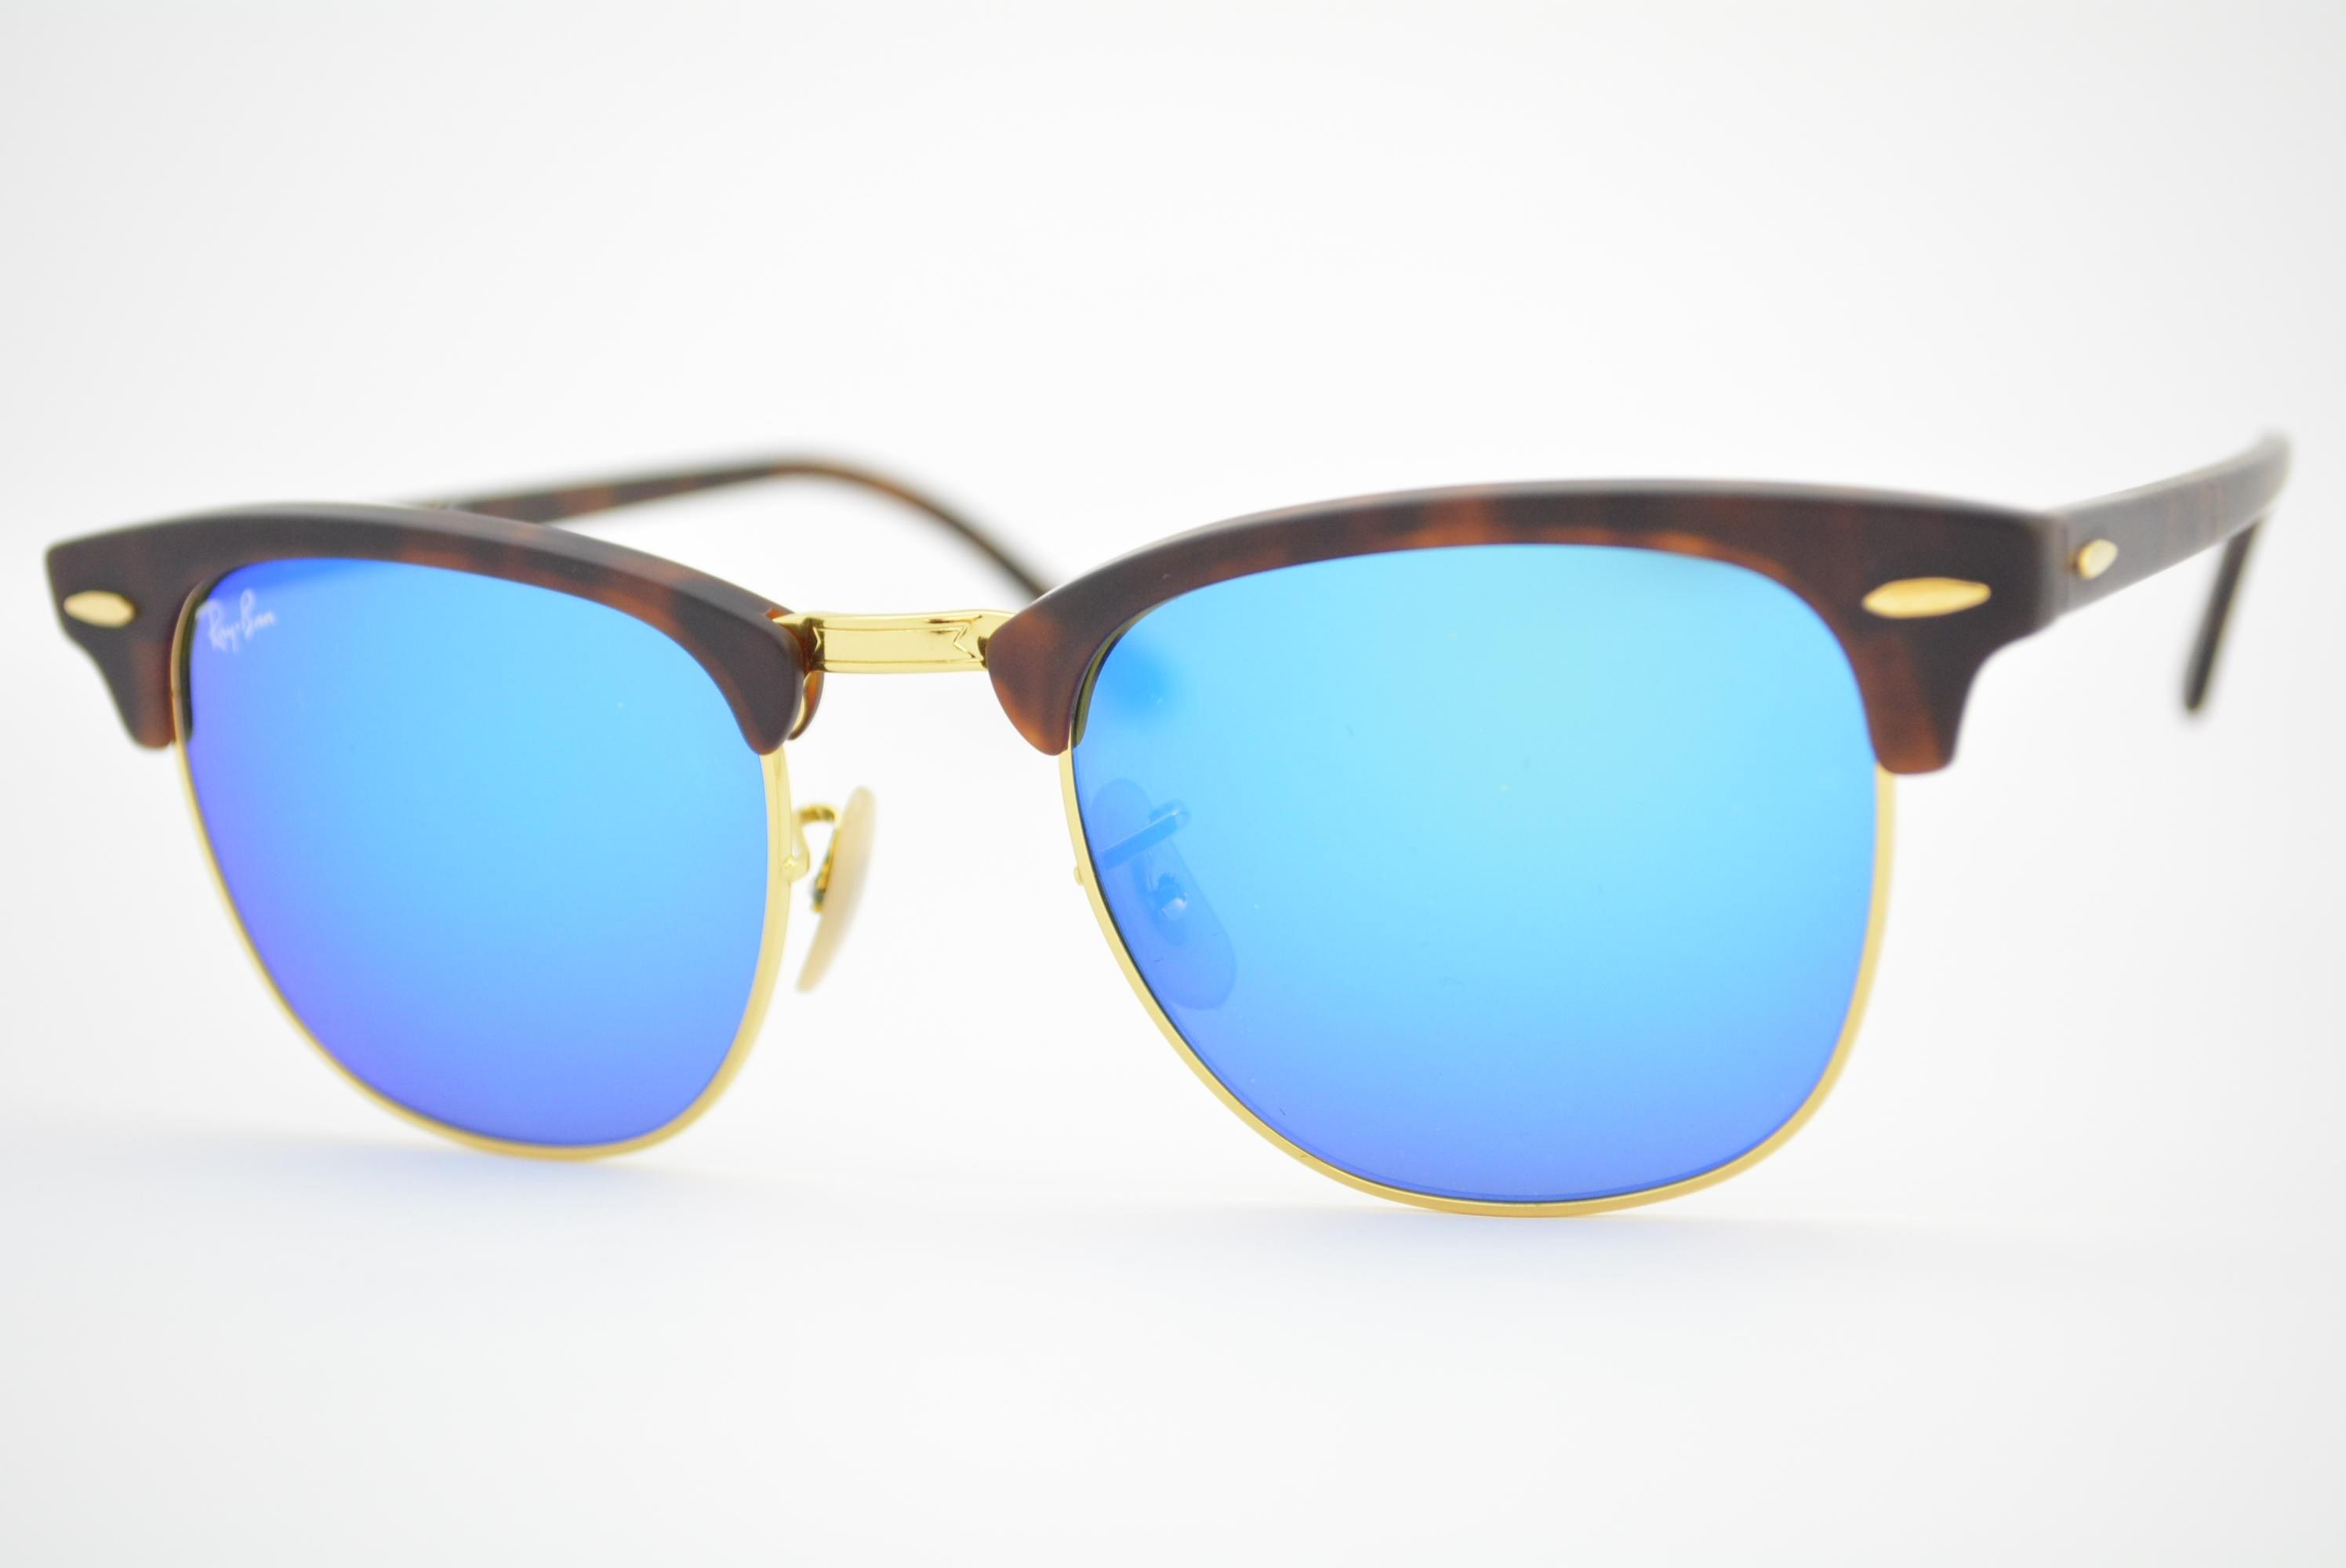 5bc3663bde800 Ray Ban Rb3016 Clubmaster óculos De Sol « One More Soul